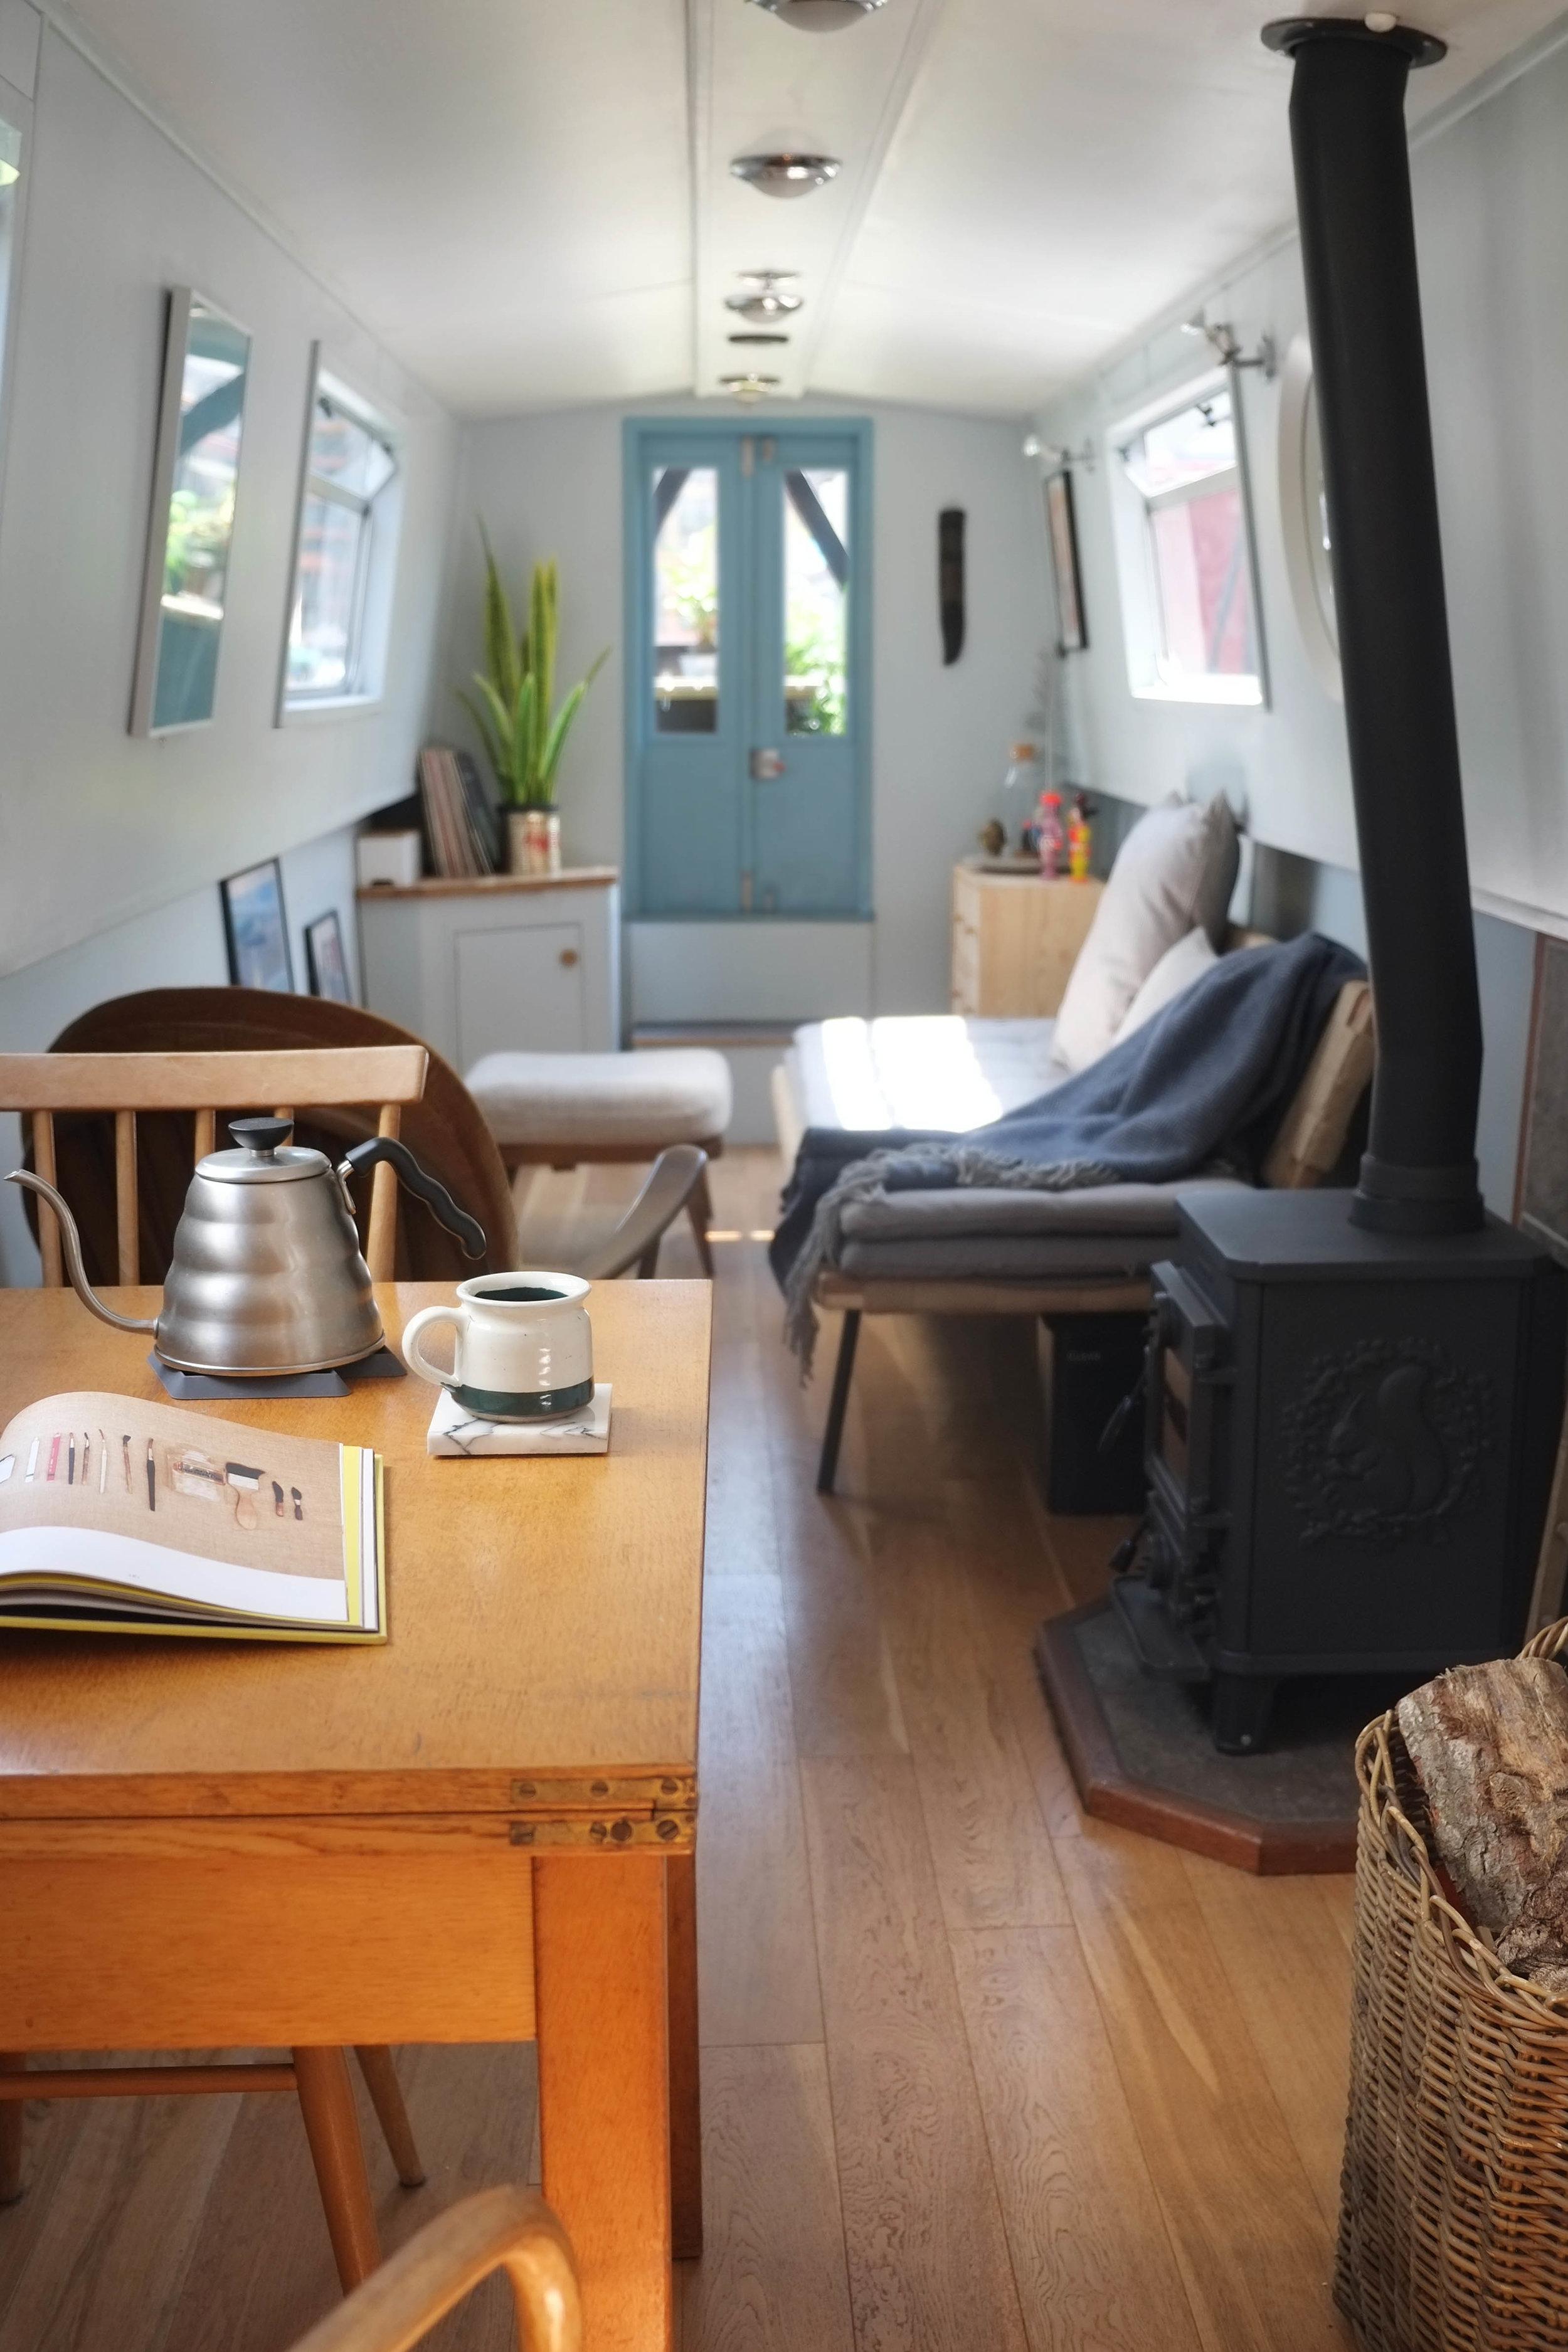 lunarlunar_interior_design_canal_boat_small_space_lounge_breakfast.jpg